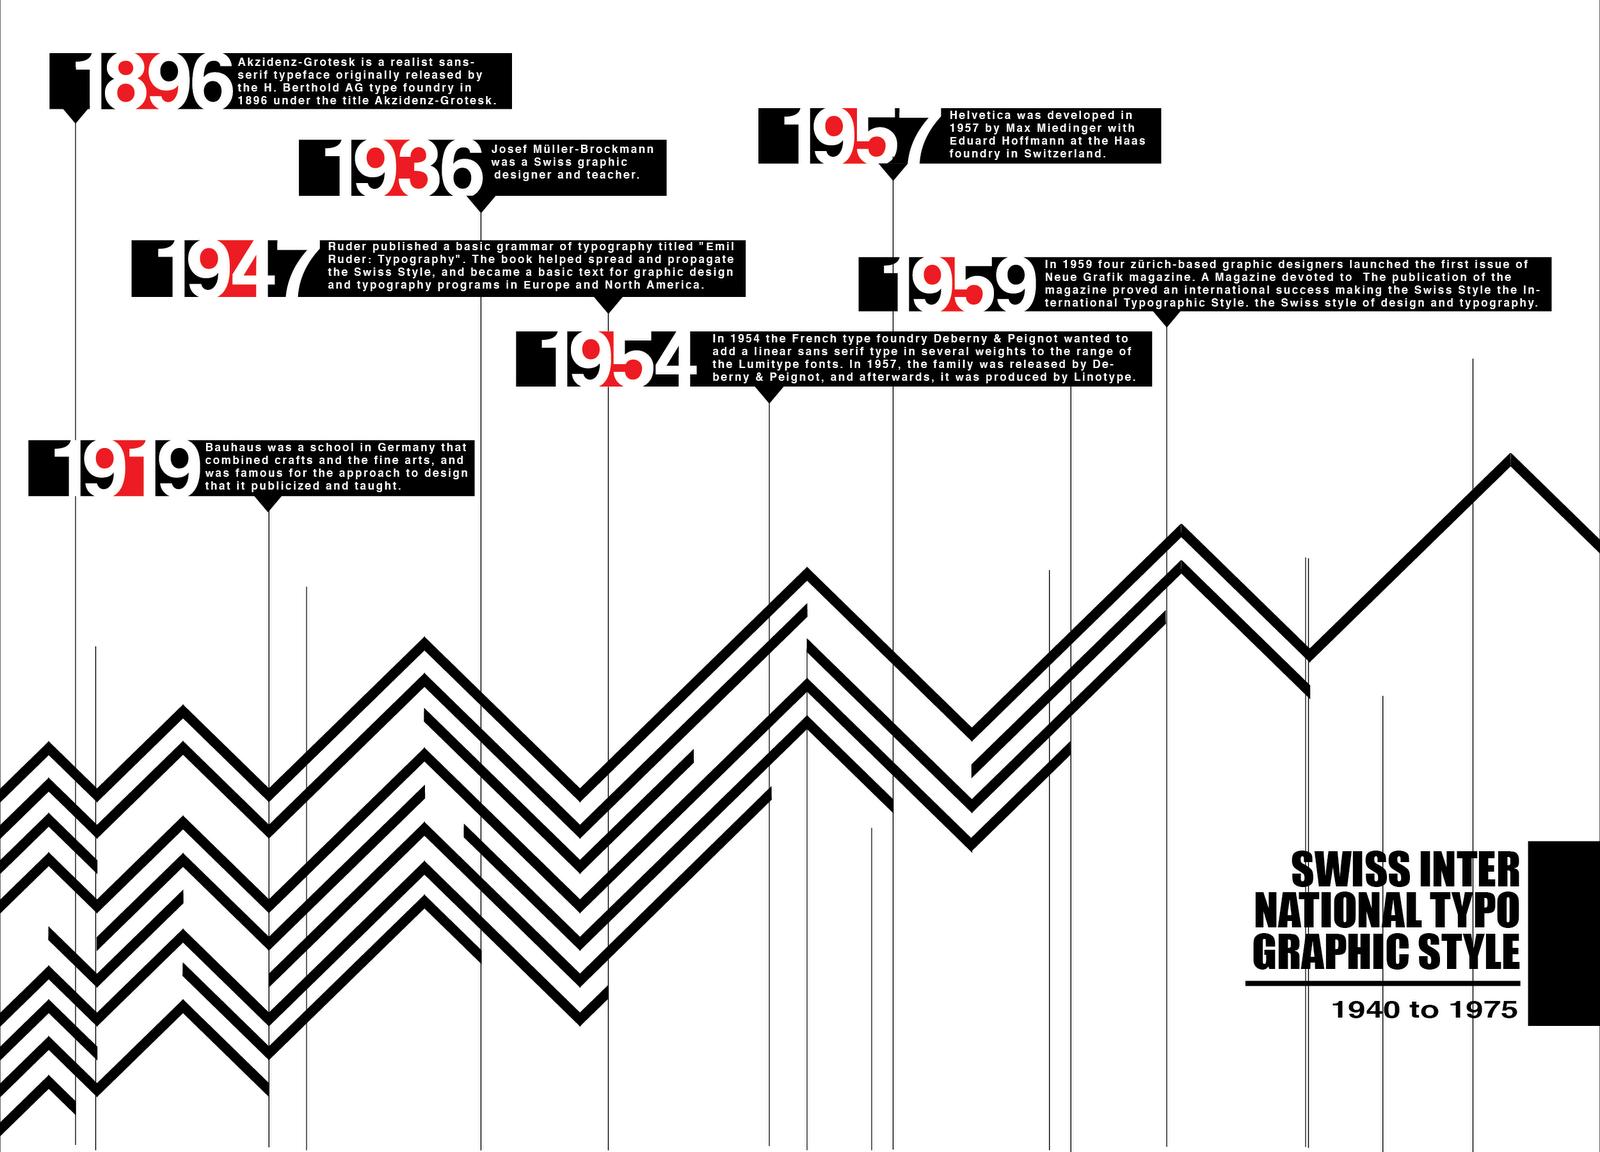 ARH3990 History of Design